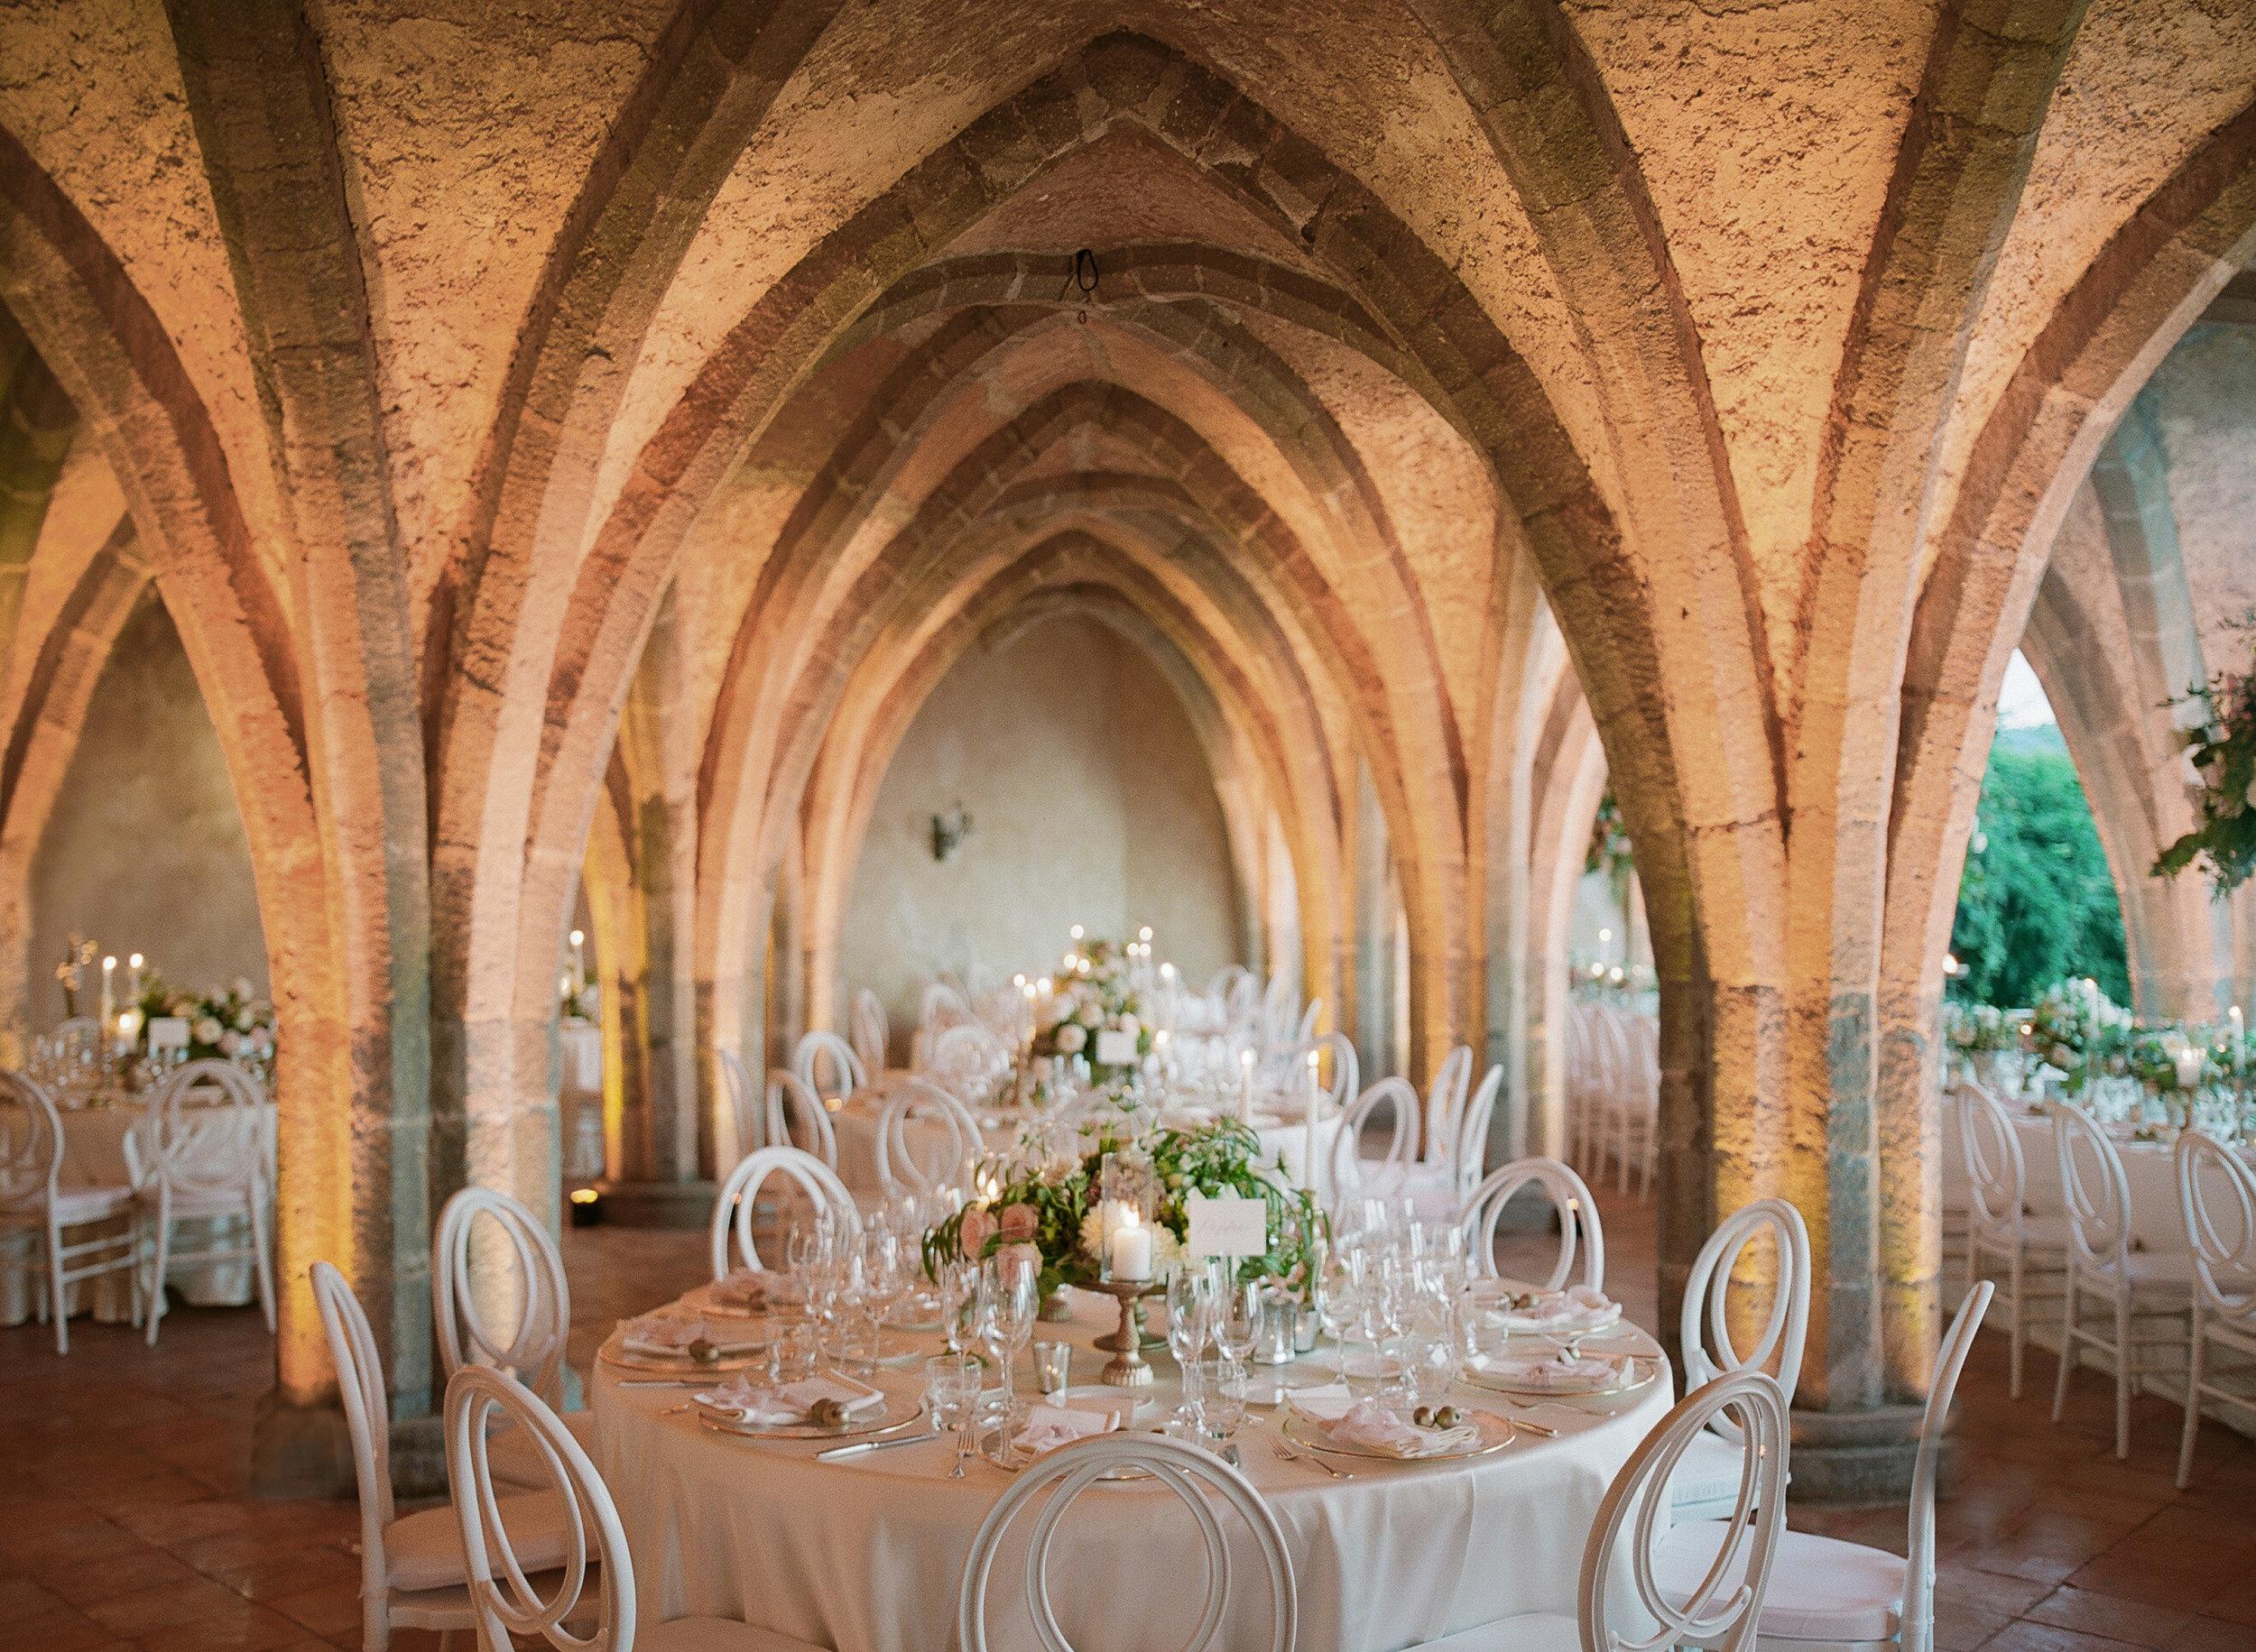 Fourteen-Forty-GaryFinck-Glamorous-Destination-Italy-Wedding-28.jpg